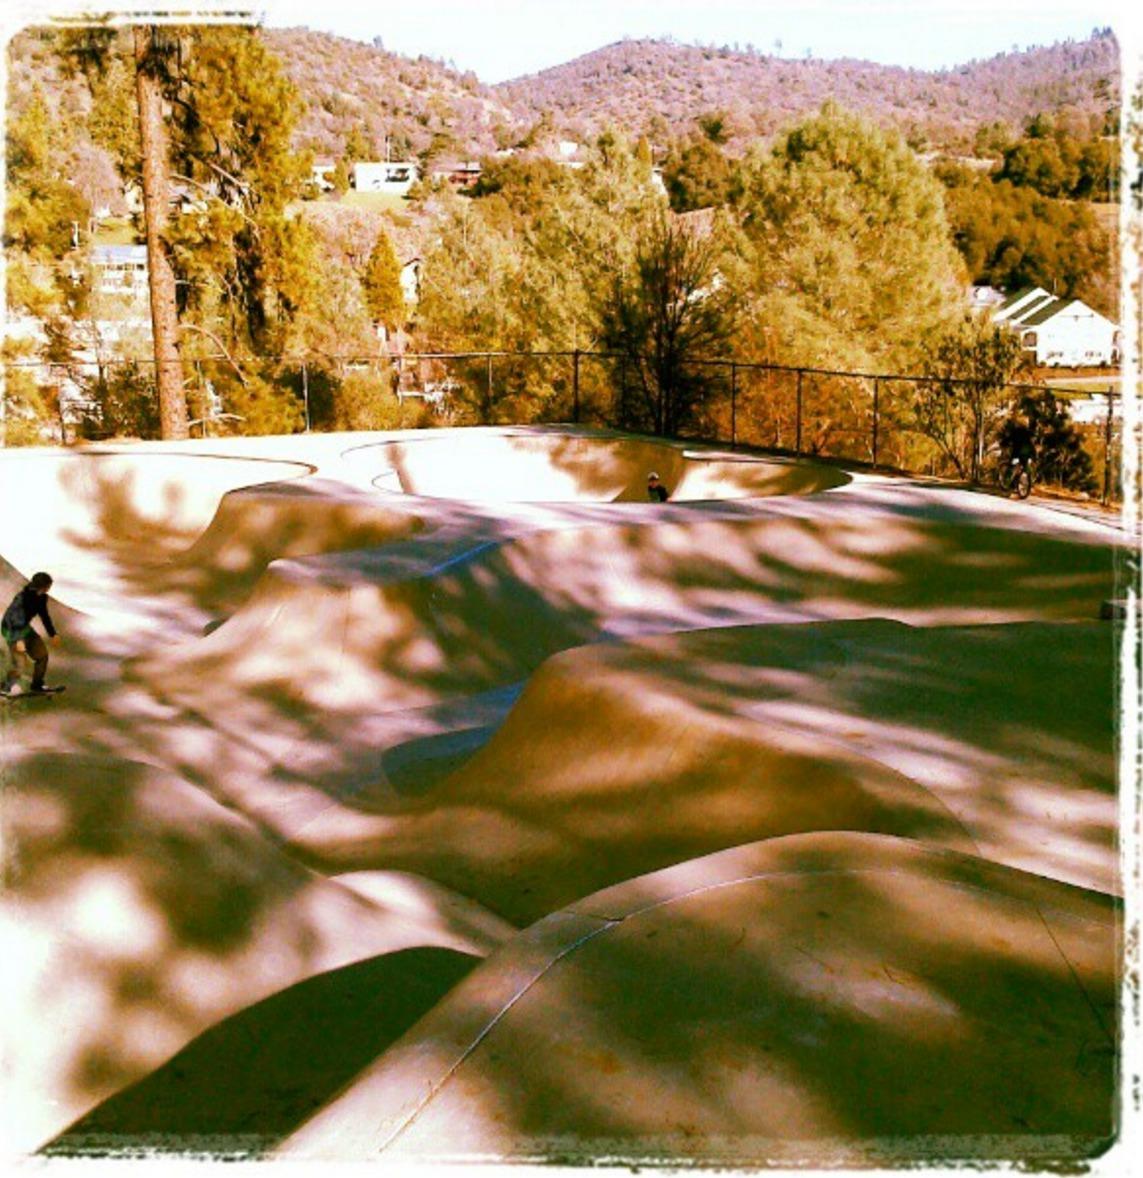 mariposa skatepark, mariposa, california